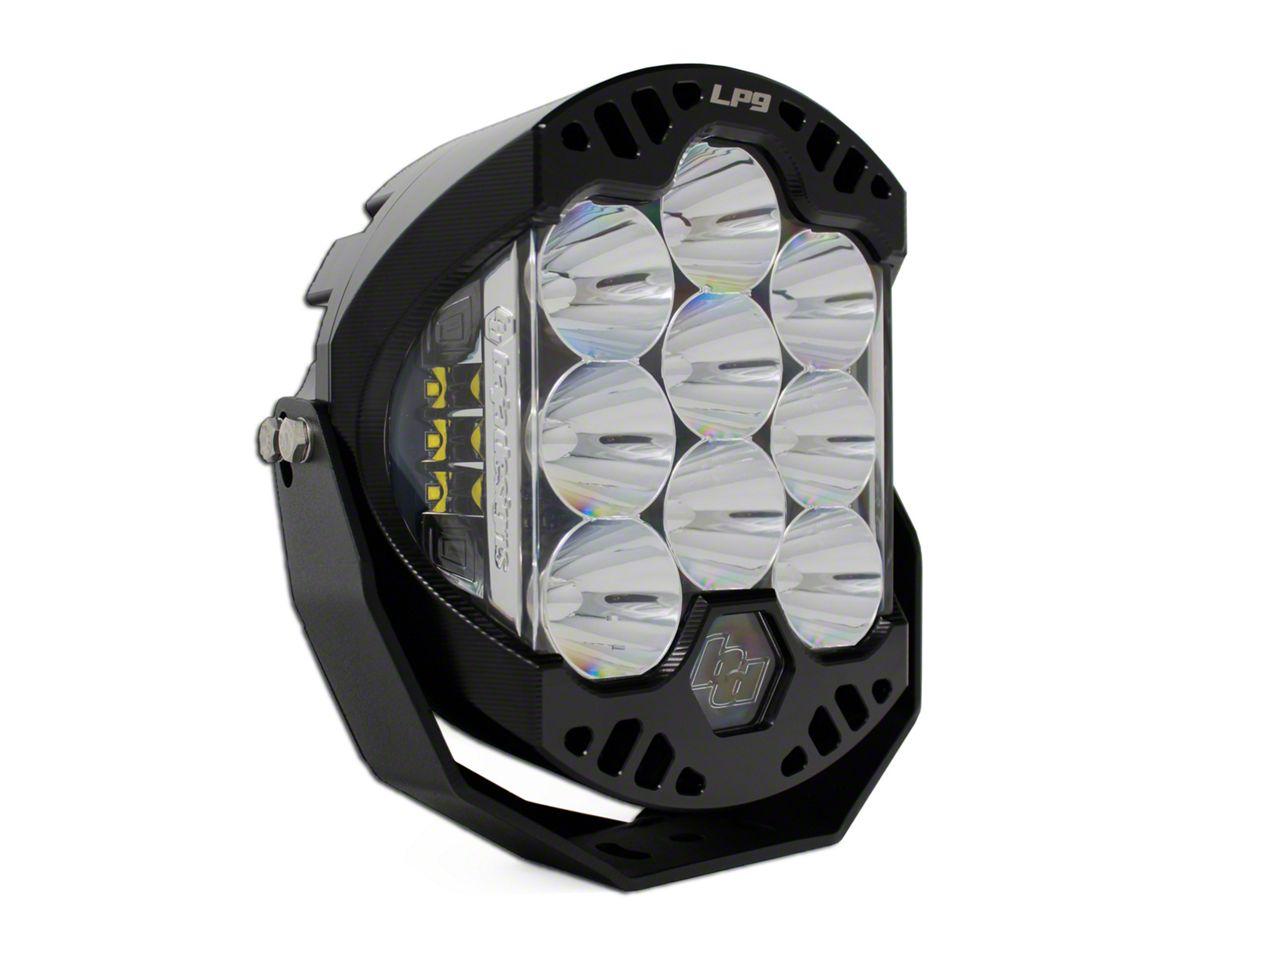 Baja Designs 8 in. LP9 Round LED Light - Driving/Combo Beam